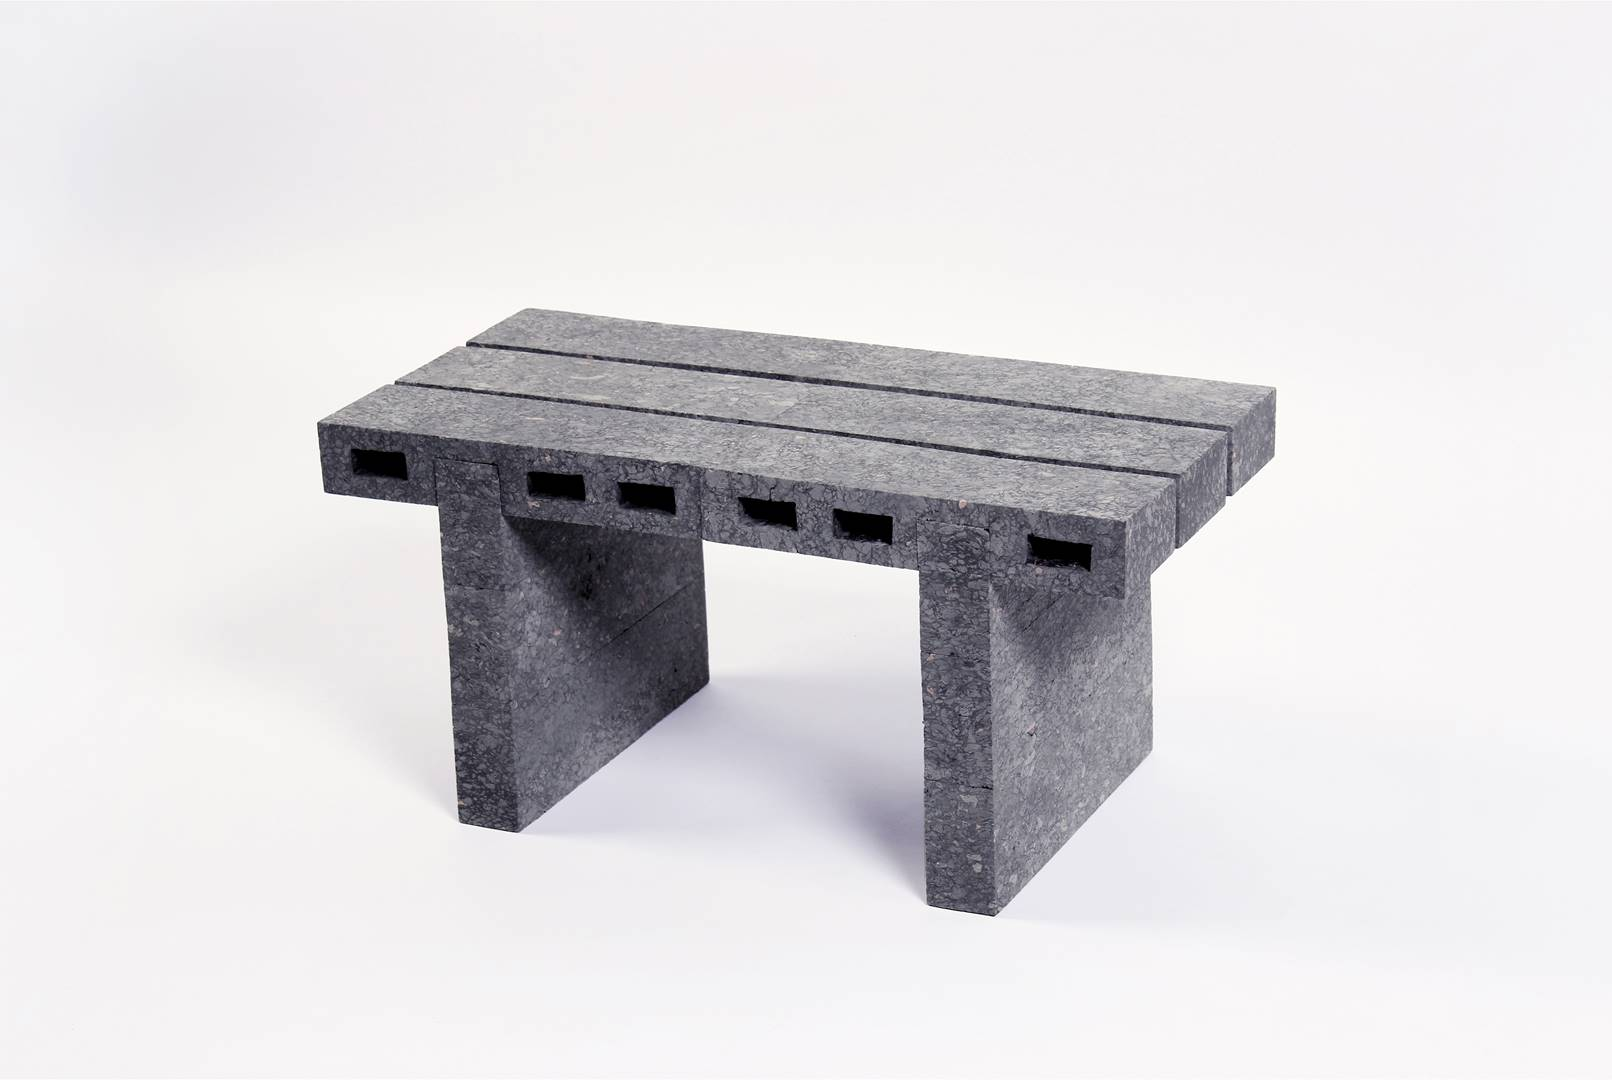 woojai_paperbricks_coffeetable_01_8in (Copy)